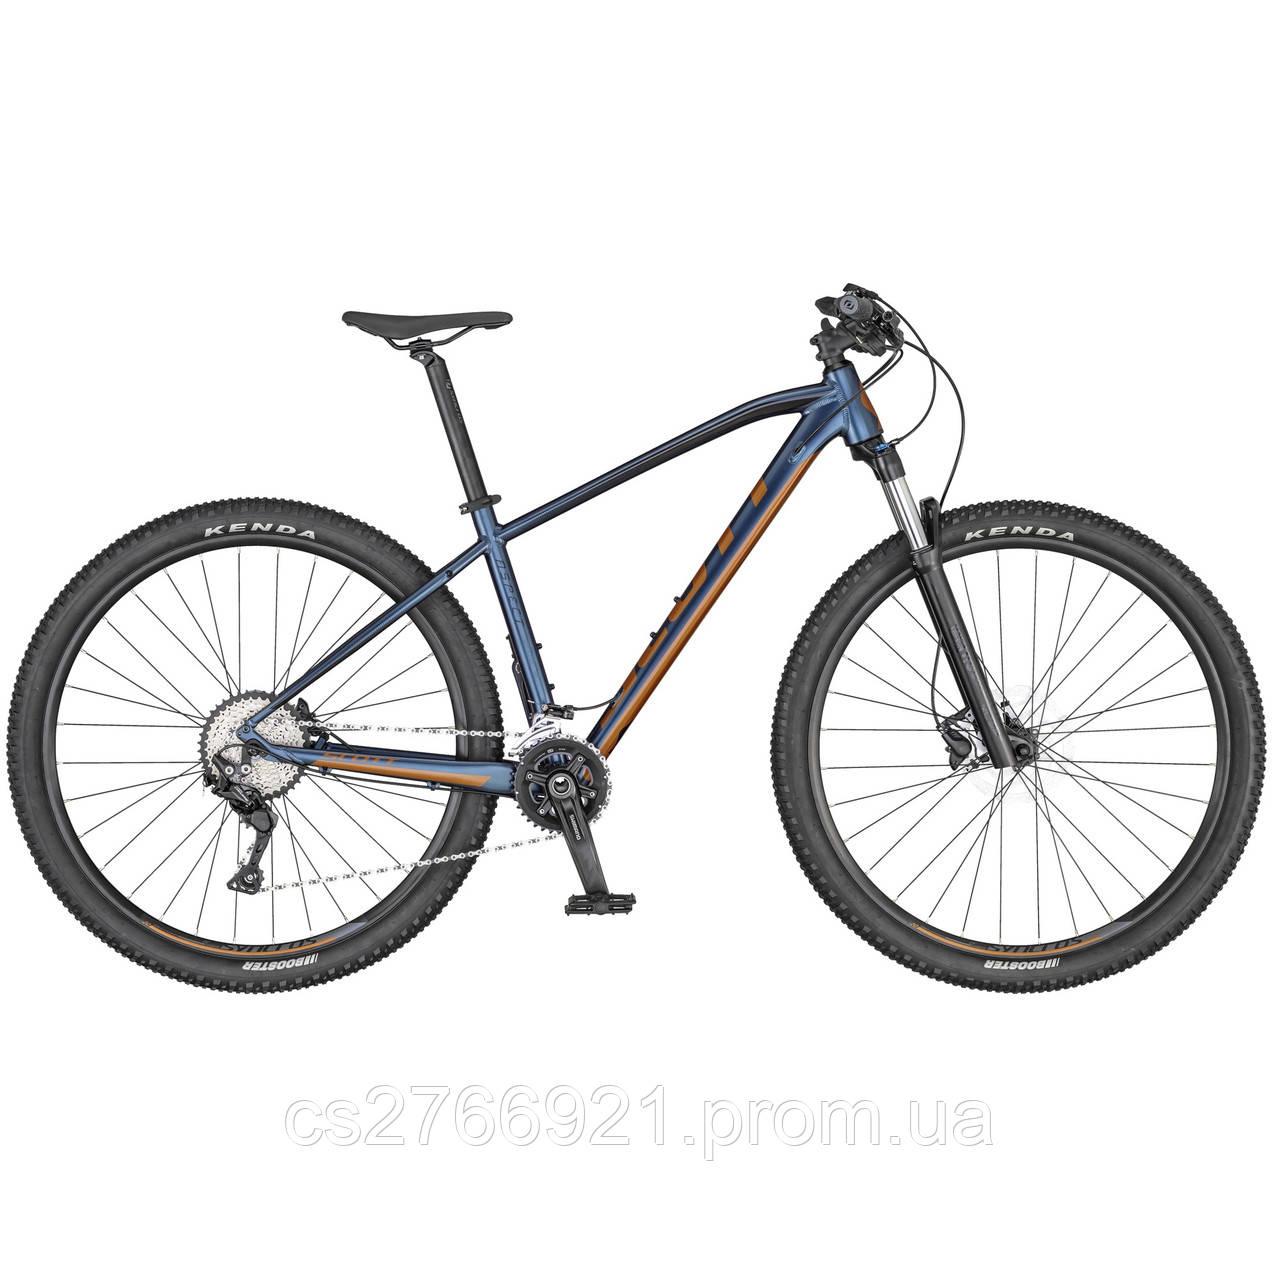 Велосипед ASPECT 920 (CN) 20 SCOTT